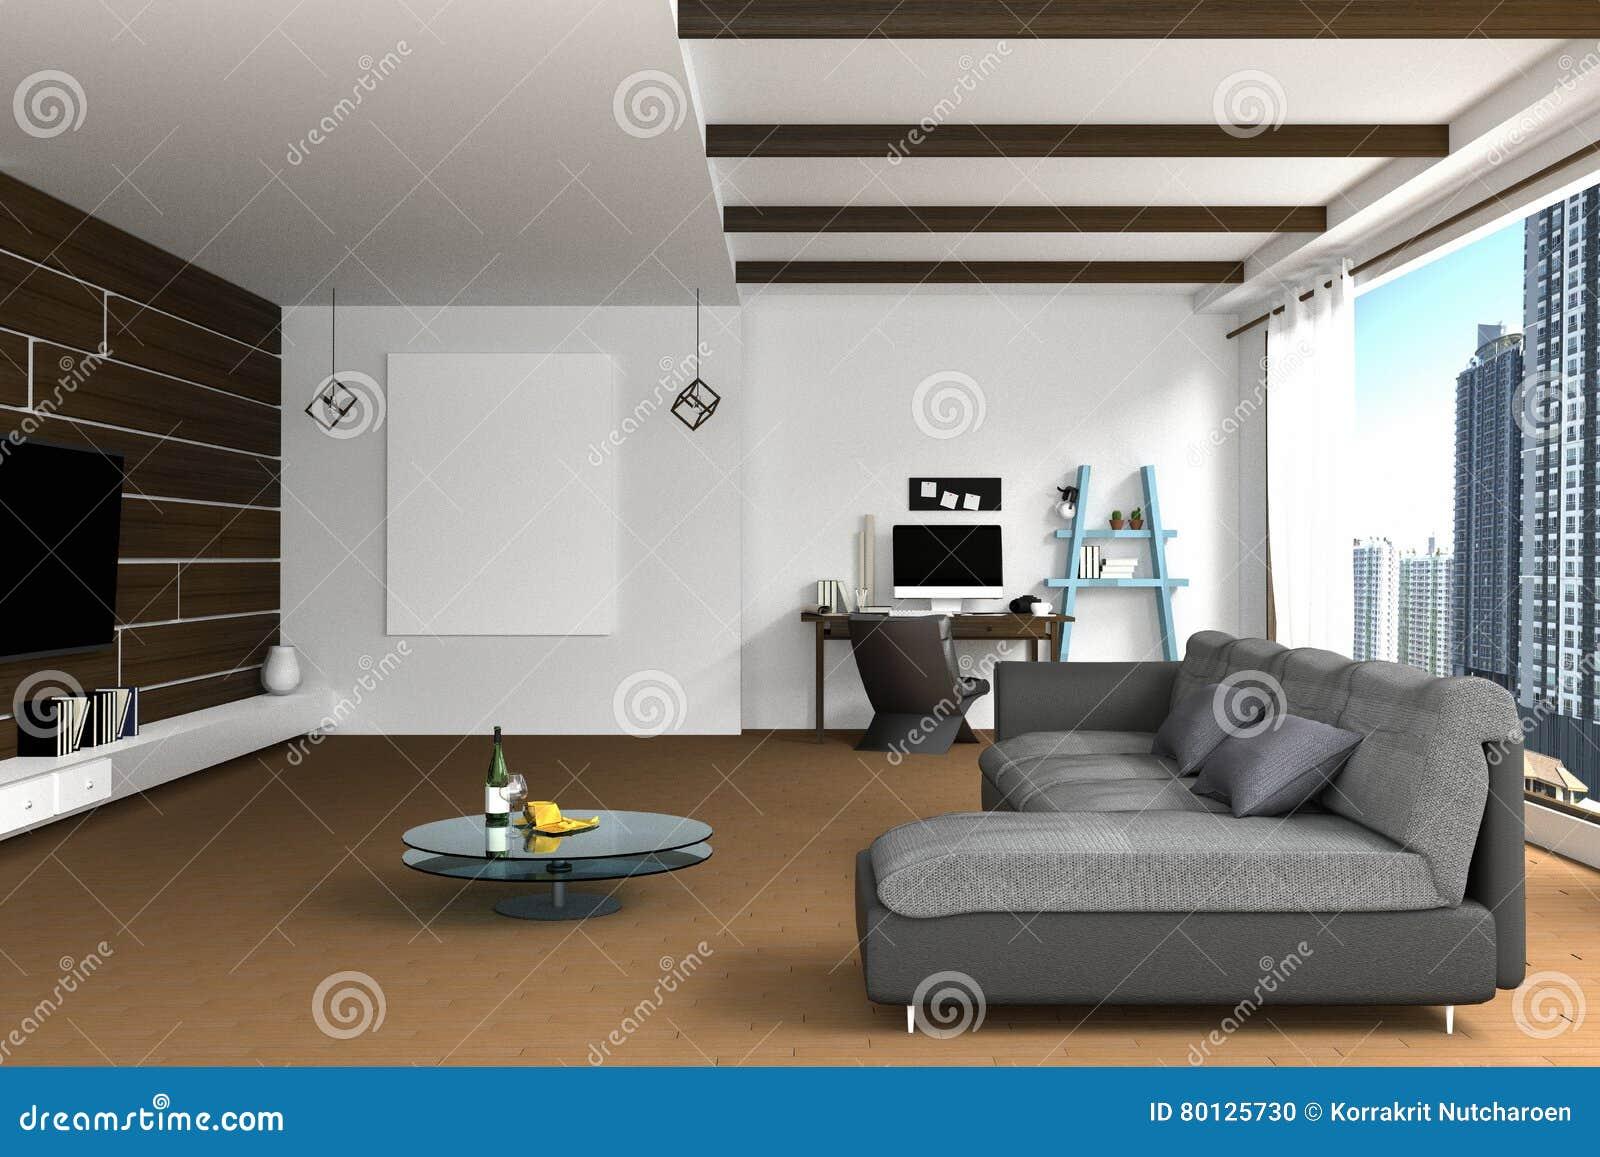 Zwarte vloer welke kleur muur